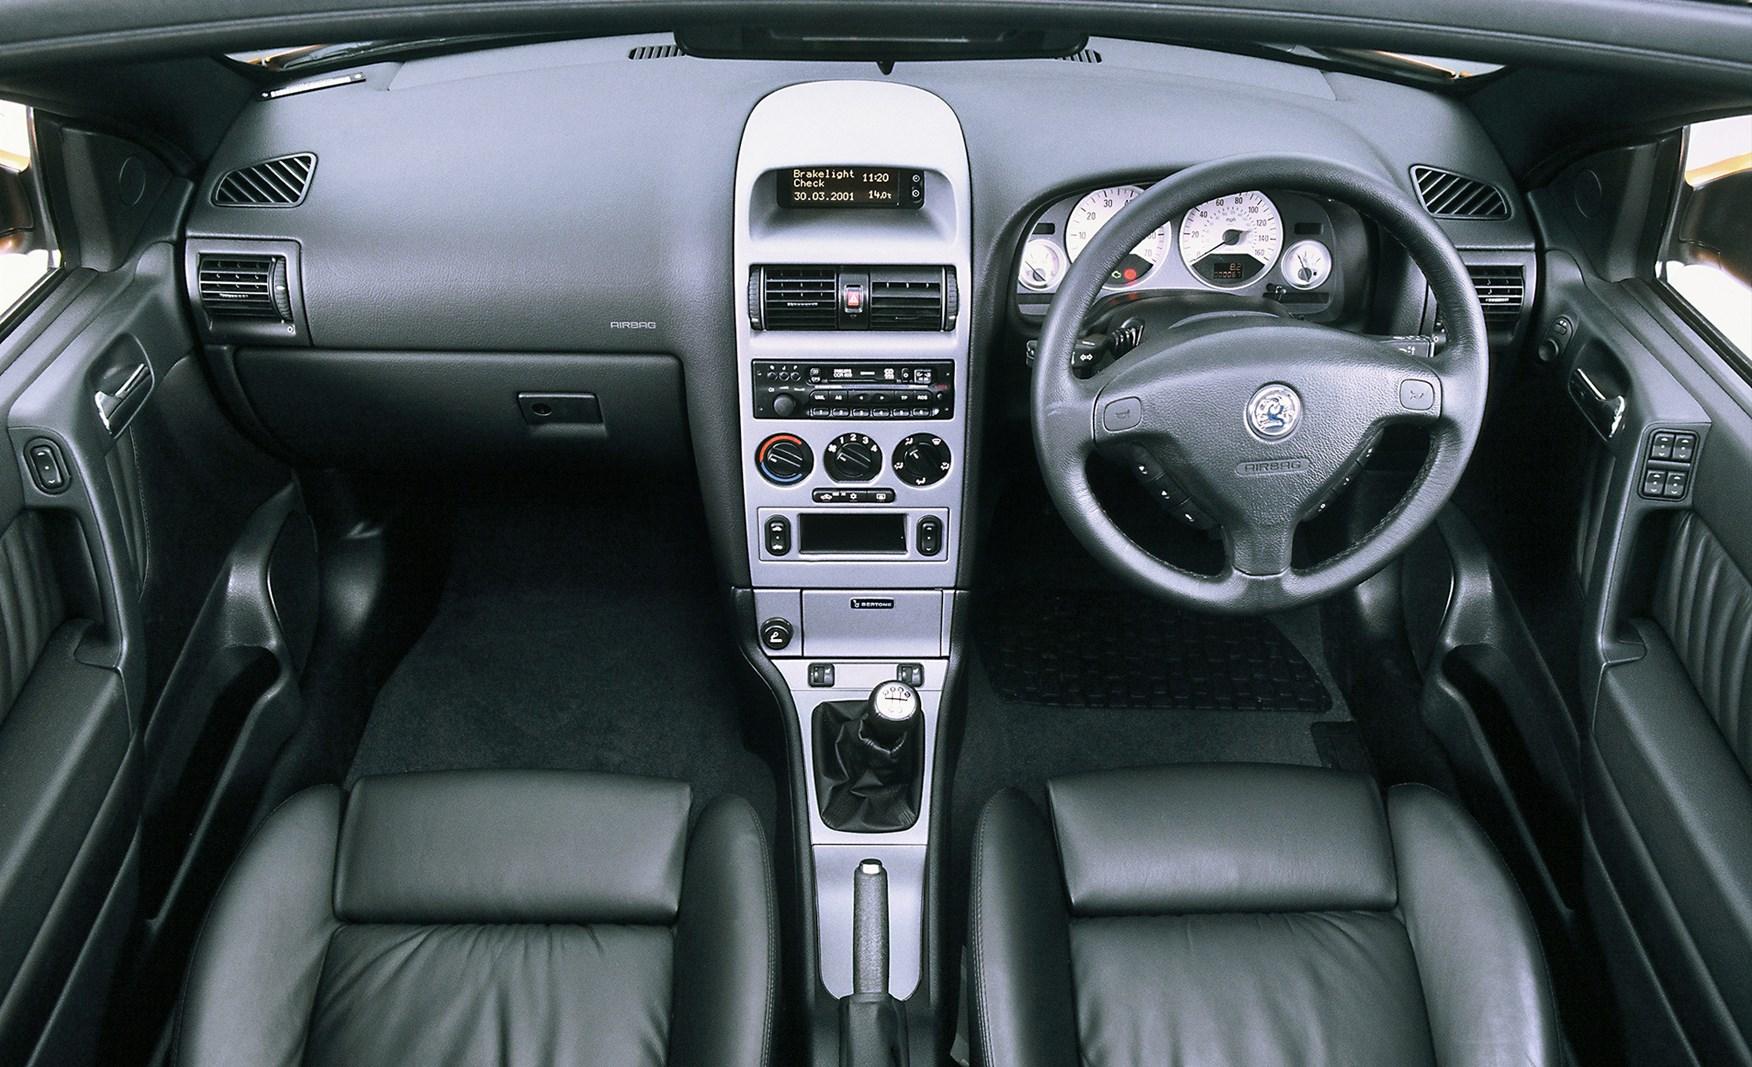 1998 2006 opel astra van truck review top speed - Behind The Wheel